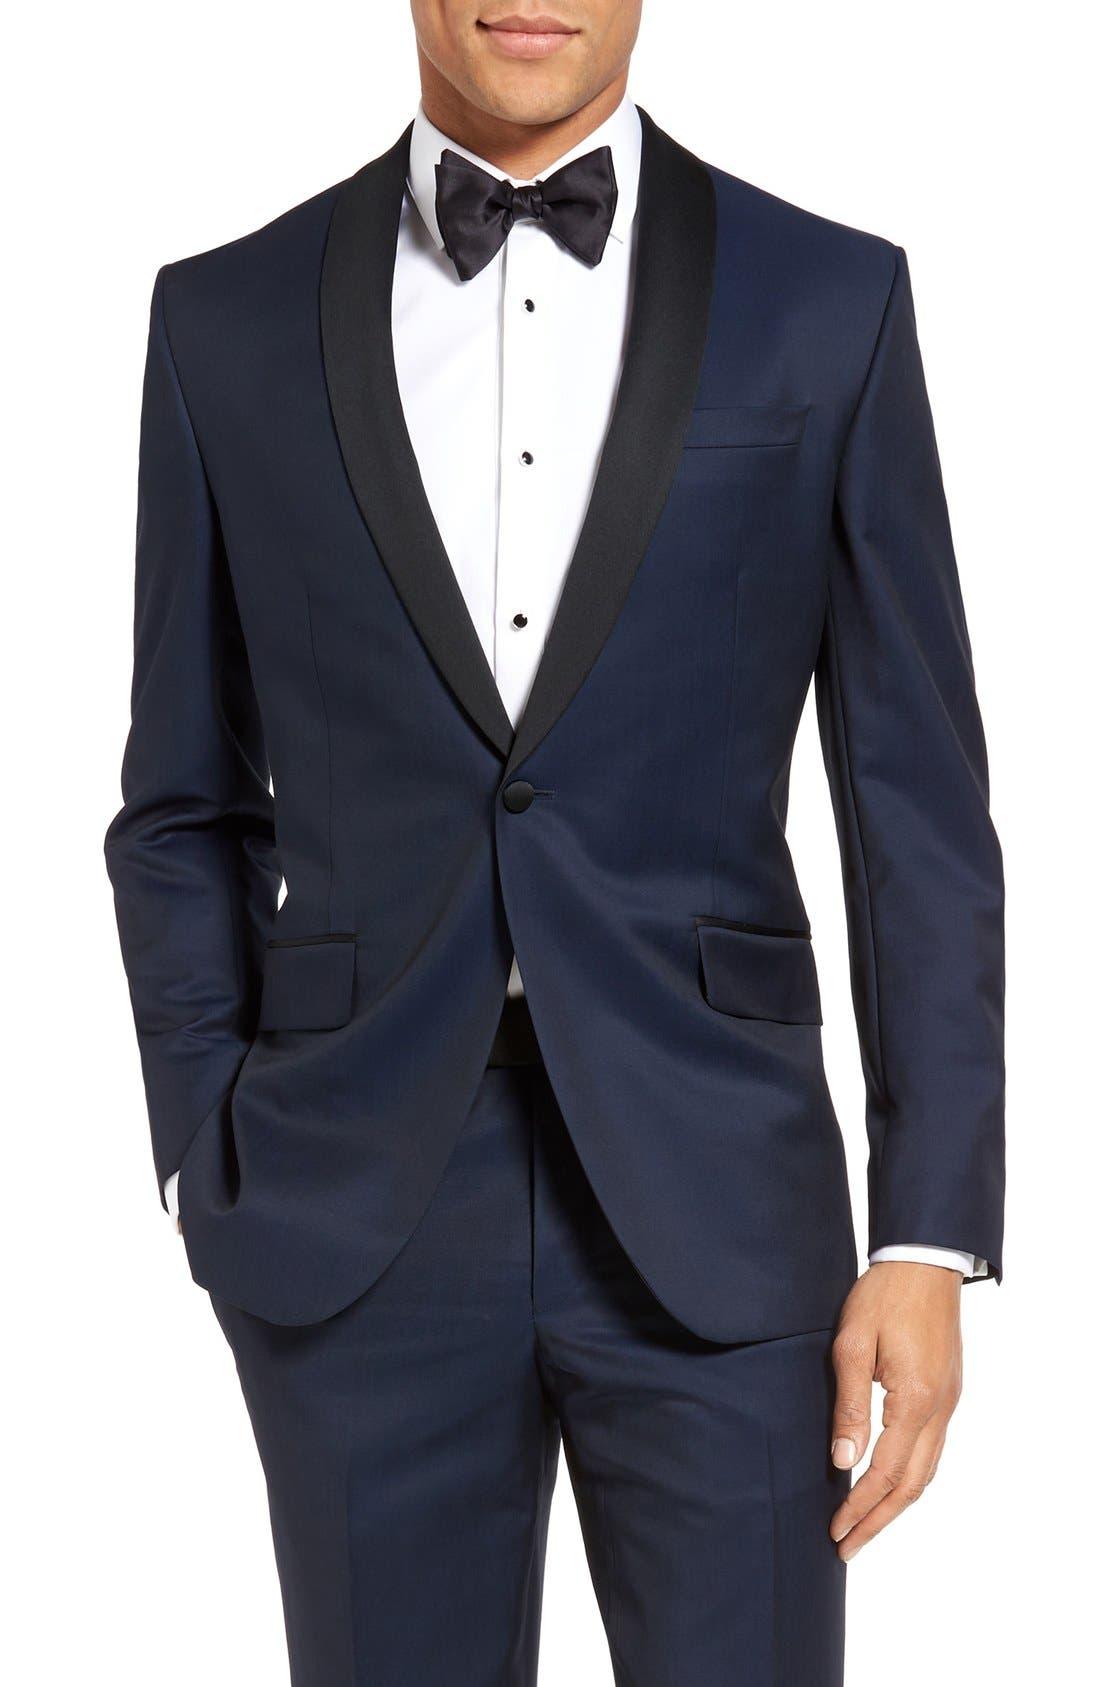 'Josh' Trim Fit Navy Shawl Lapel Tuxedo,                             Alternate thumbnail 7, color,                             NAVY BLUE